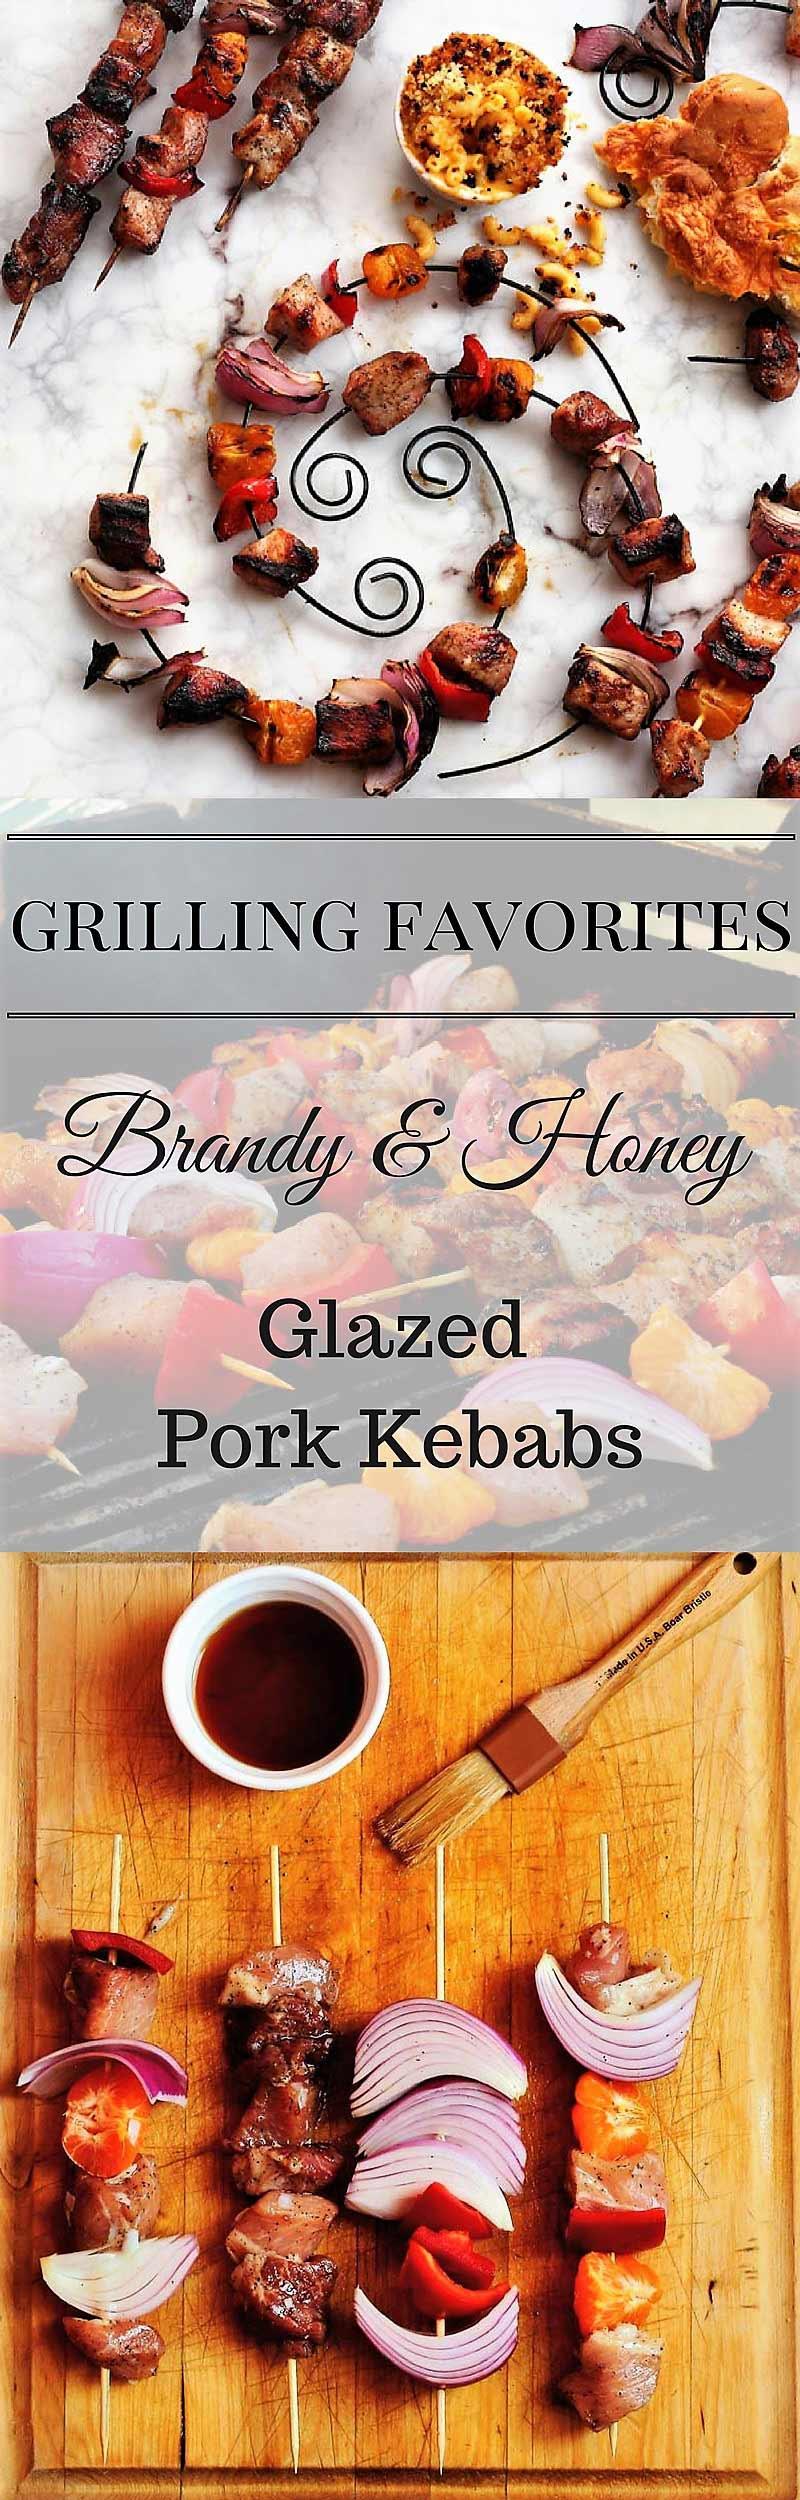 Brandy and honey Glazed Pork Kebabs Brandy Brown Sugar Onion Red Pepper Mandarin Orange